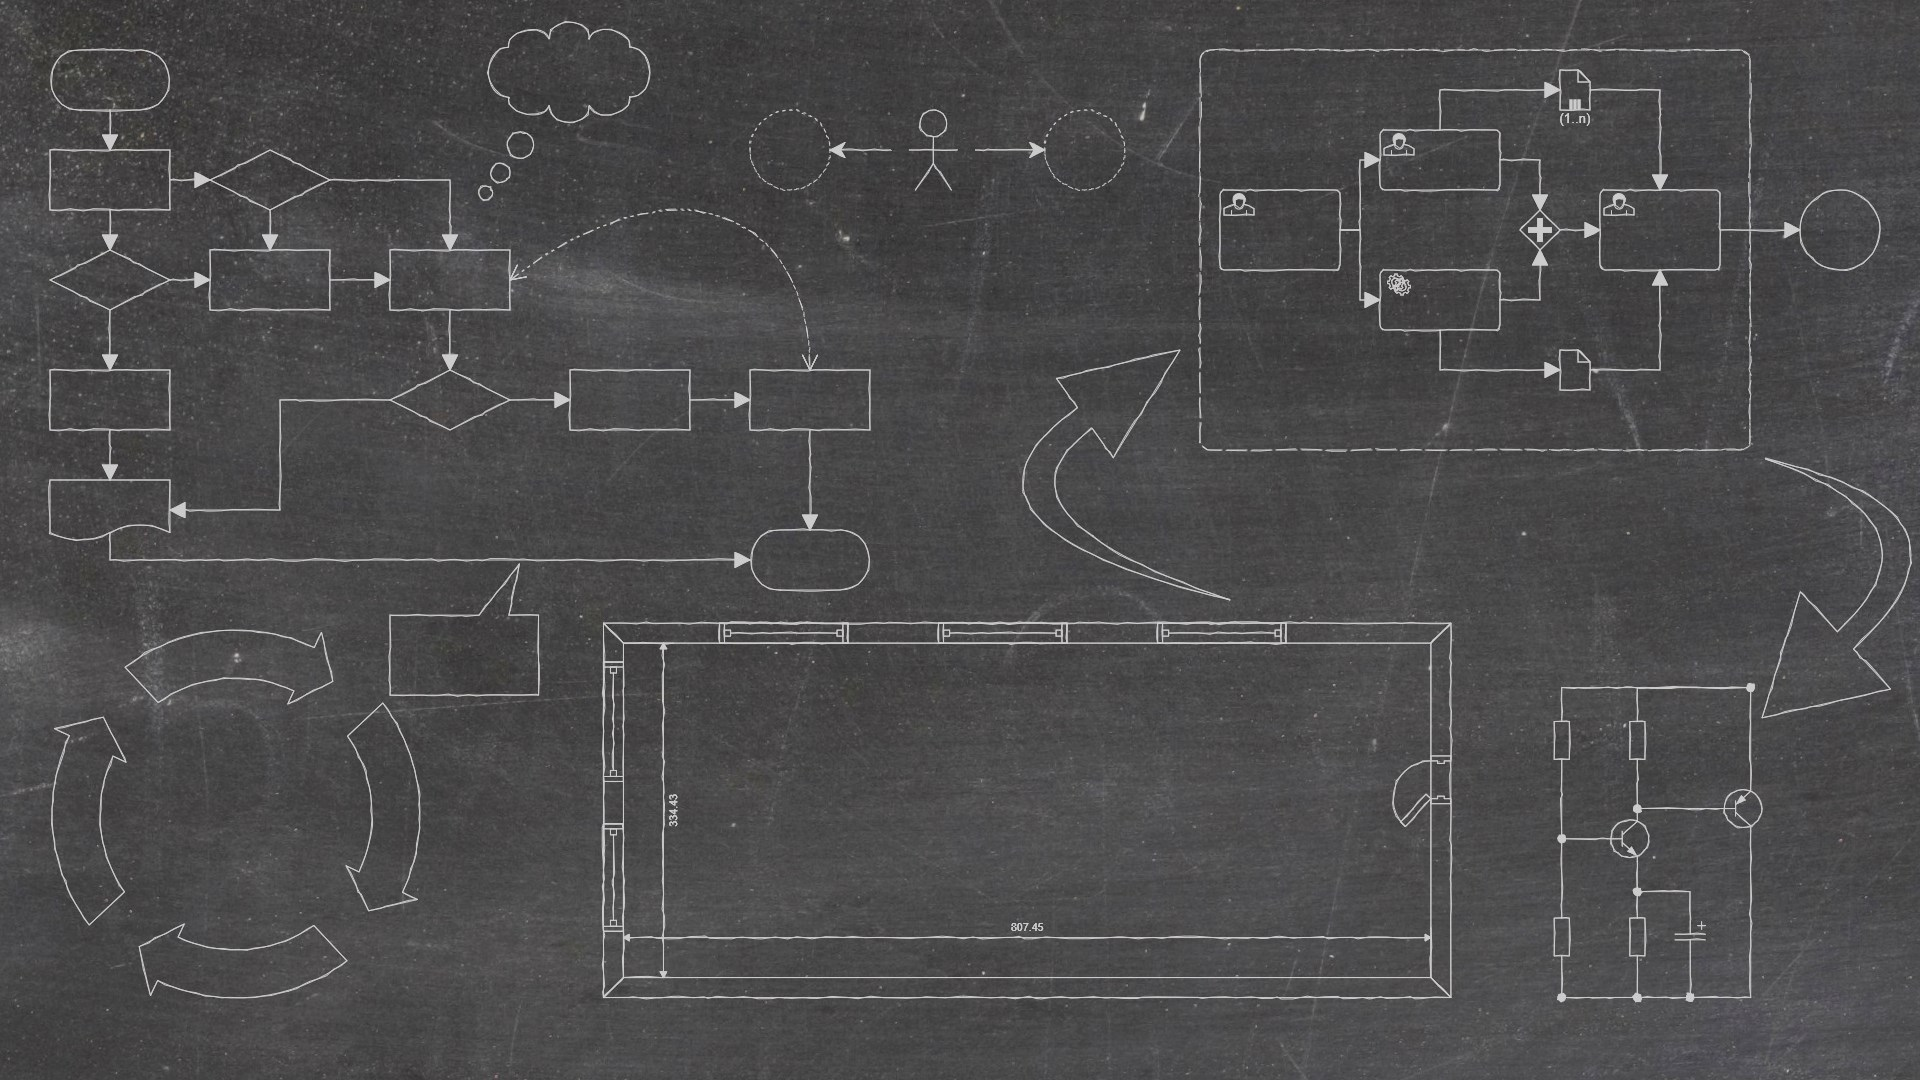 medium resolution of buy grapholite diagrams flow charts and floor plans designer microsoft store en ca